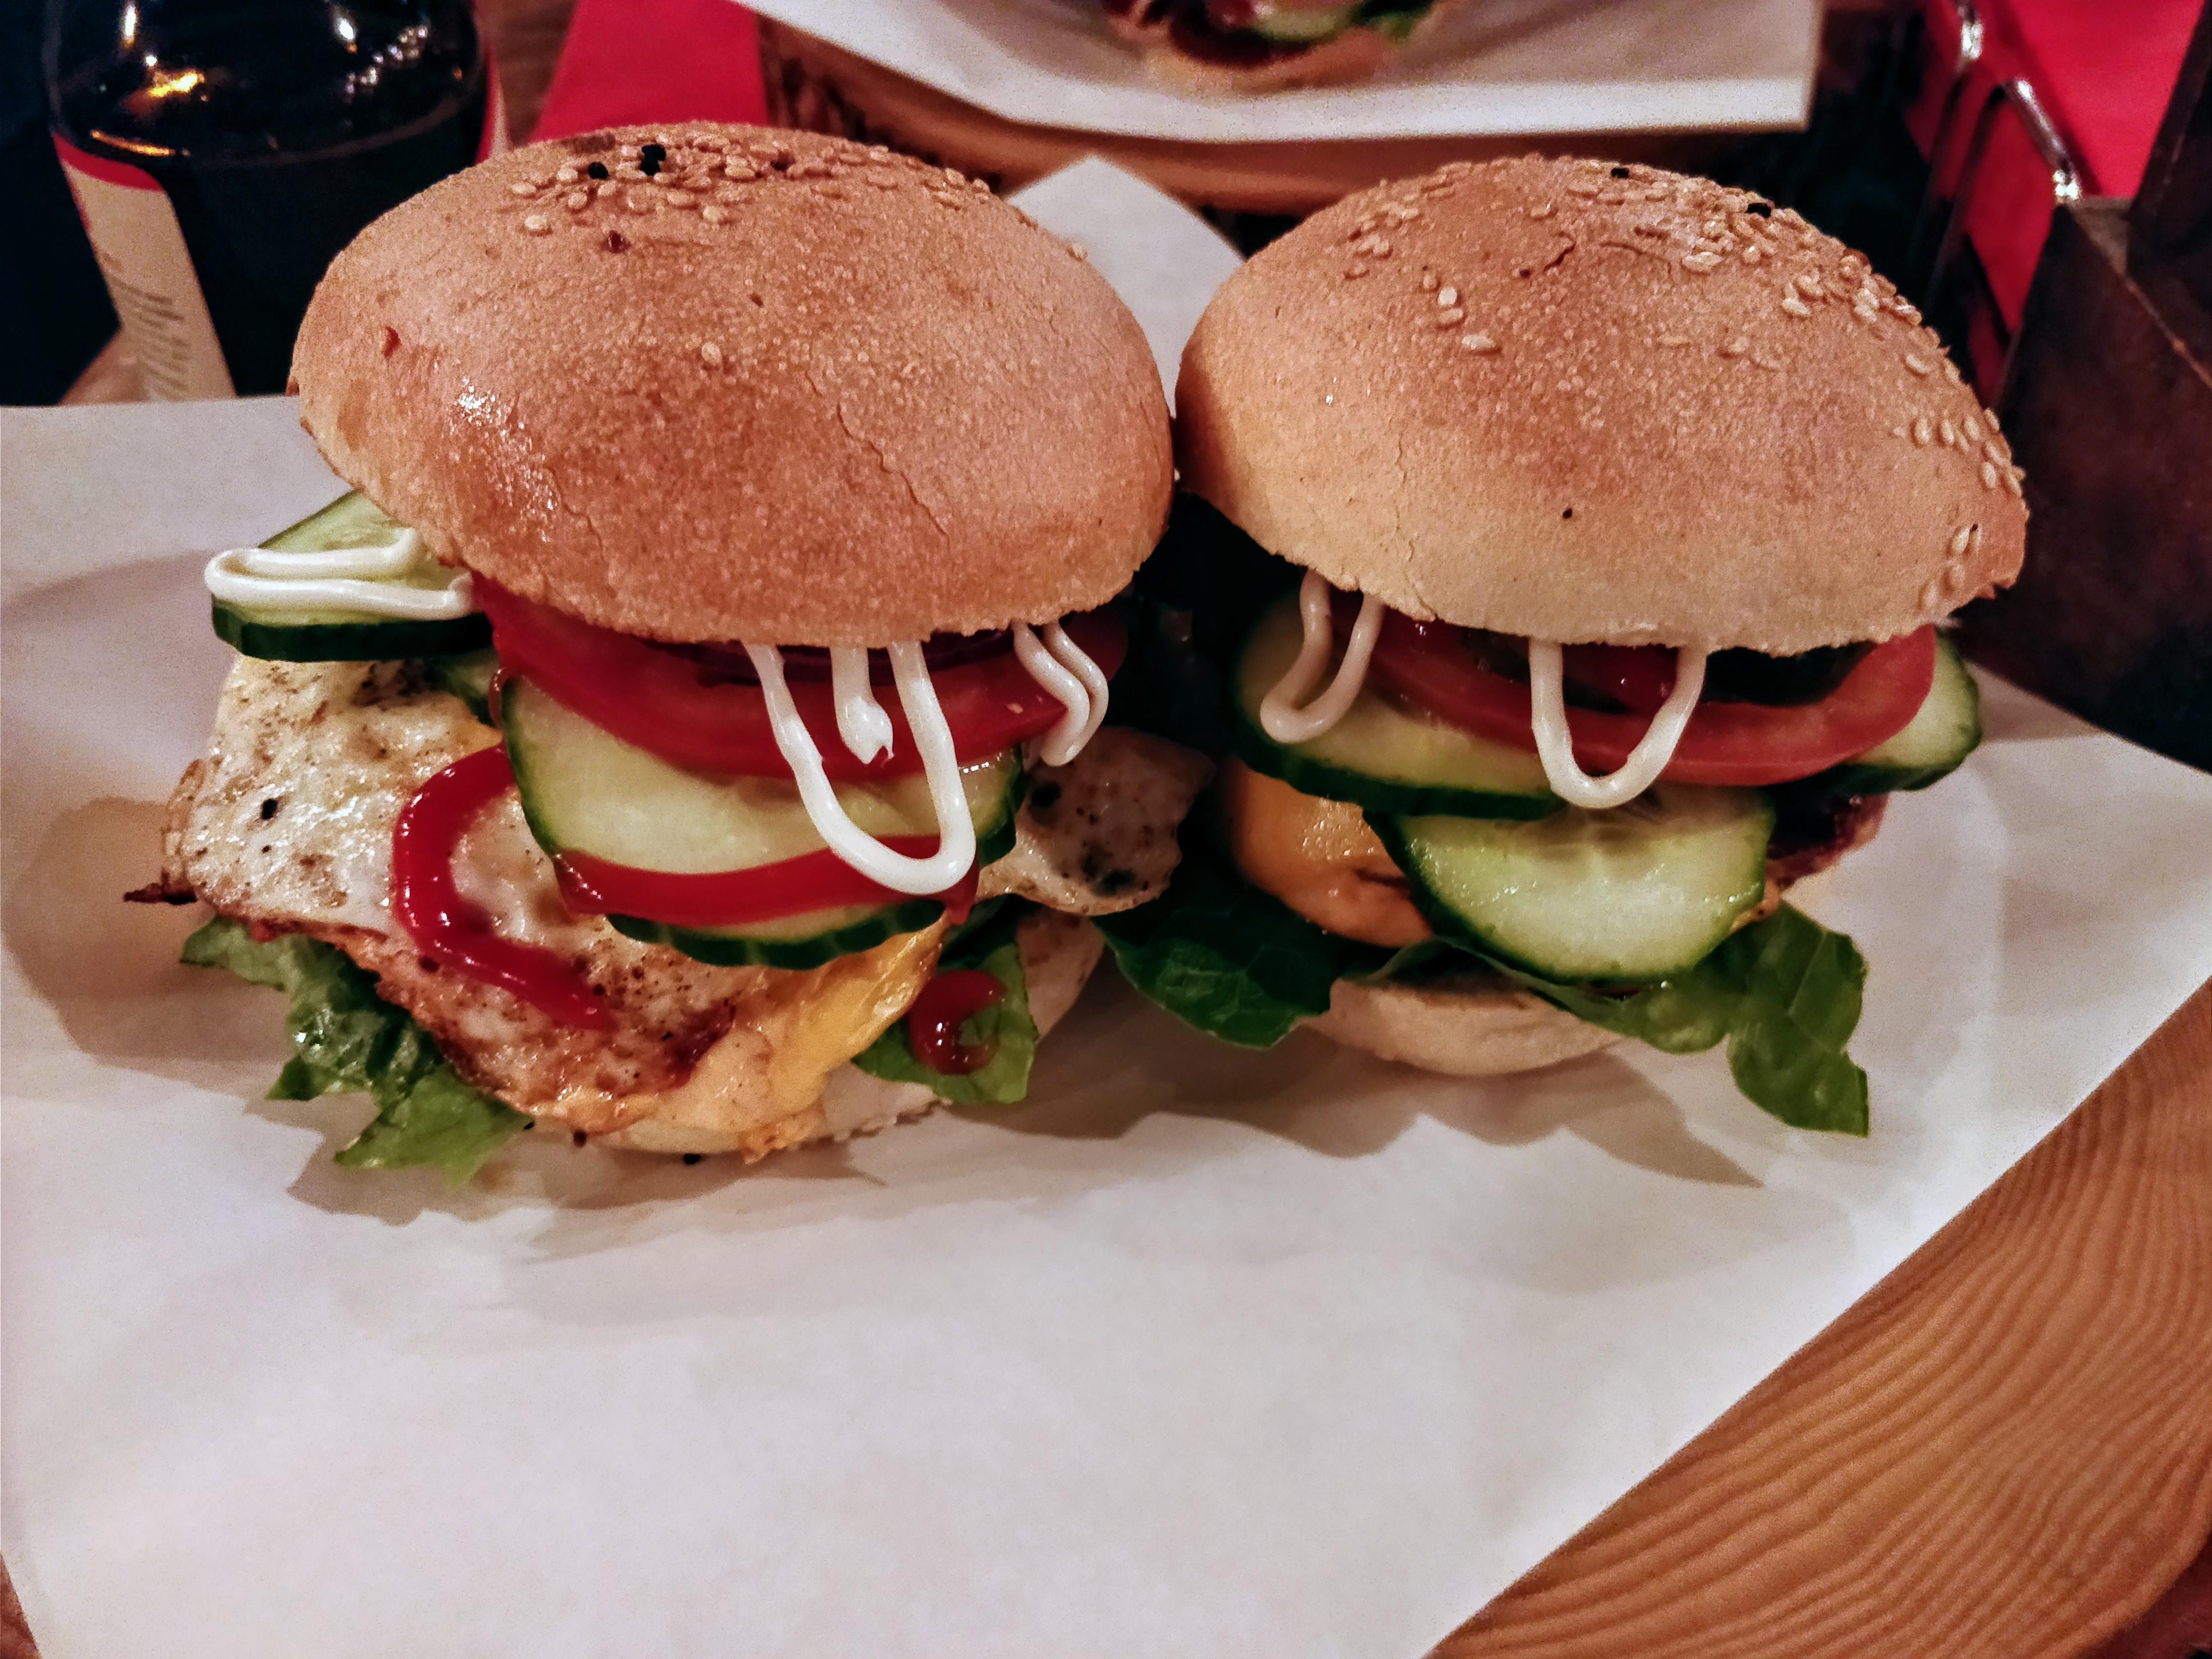 http://foodloader.net/nico_2017-10-06_barbecueburger-und-cheggburger.jpg